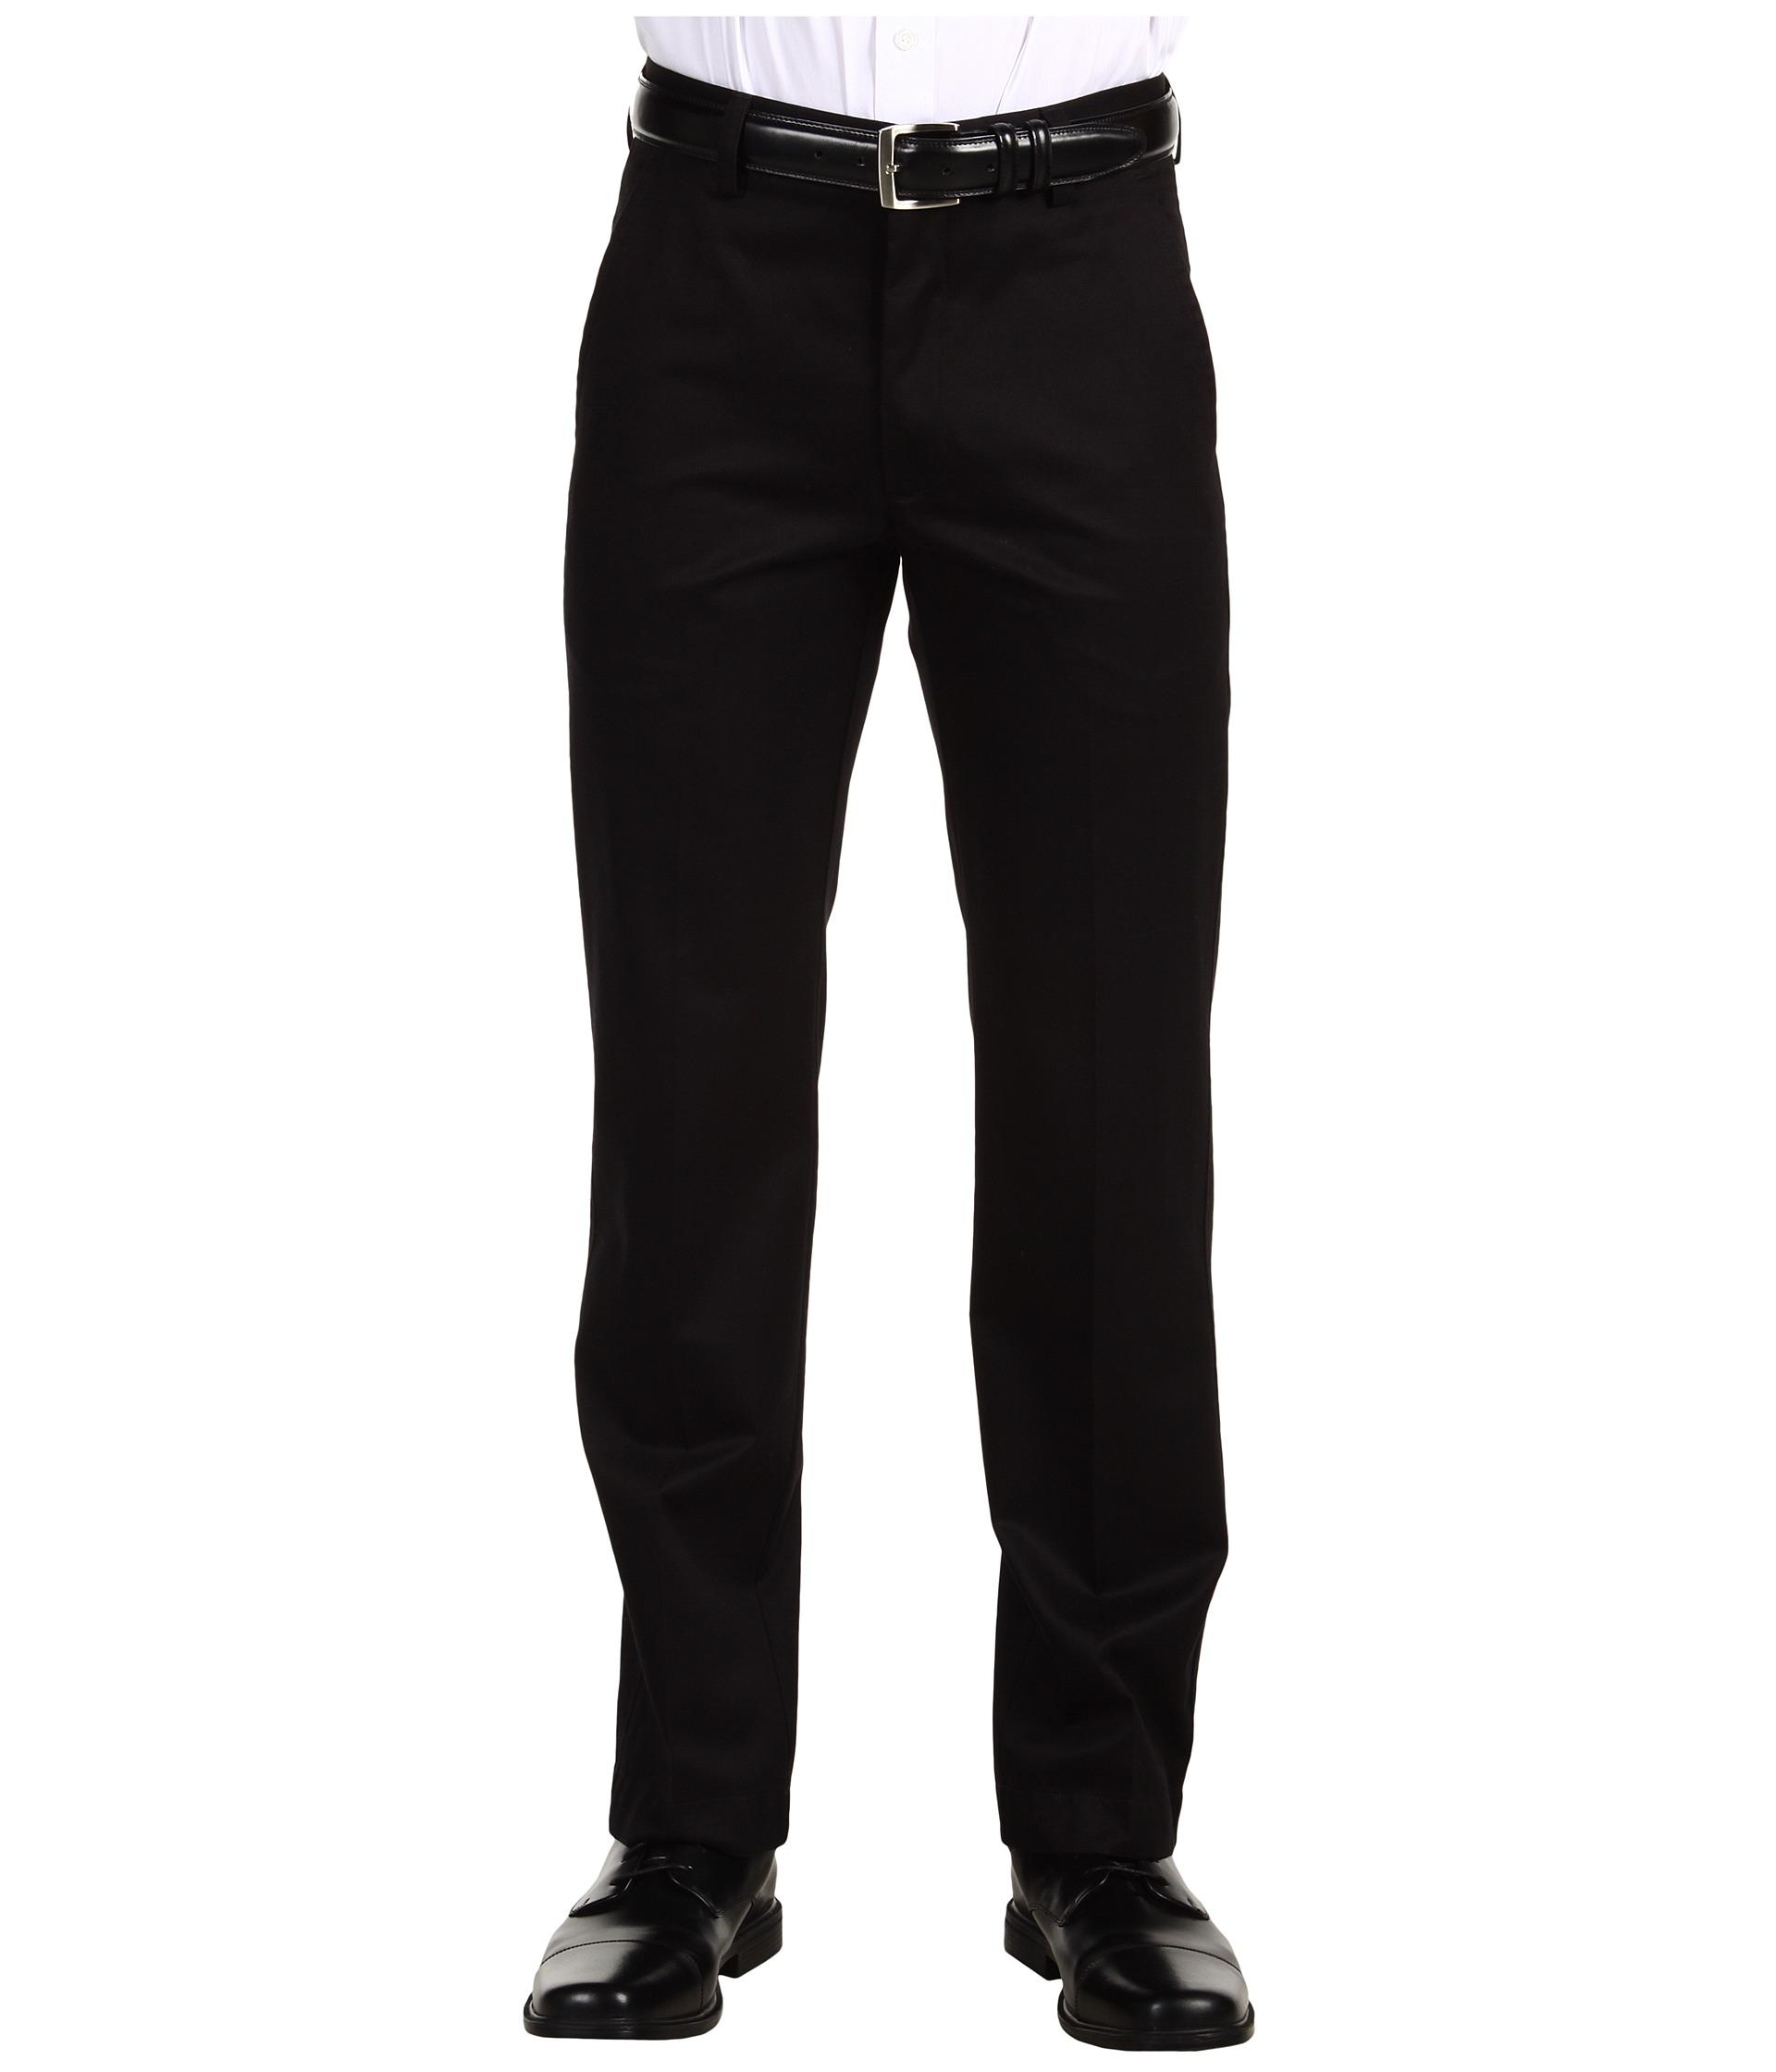 Tall Dress Pants For Men